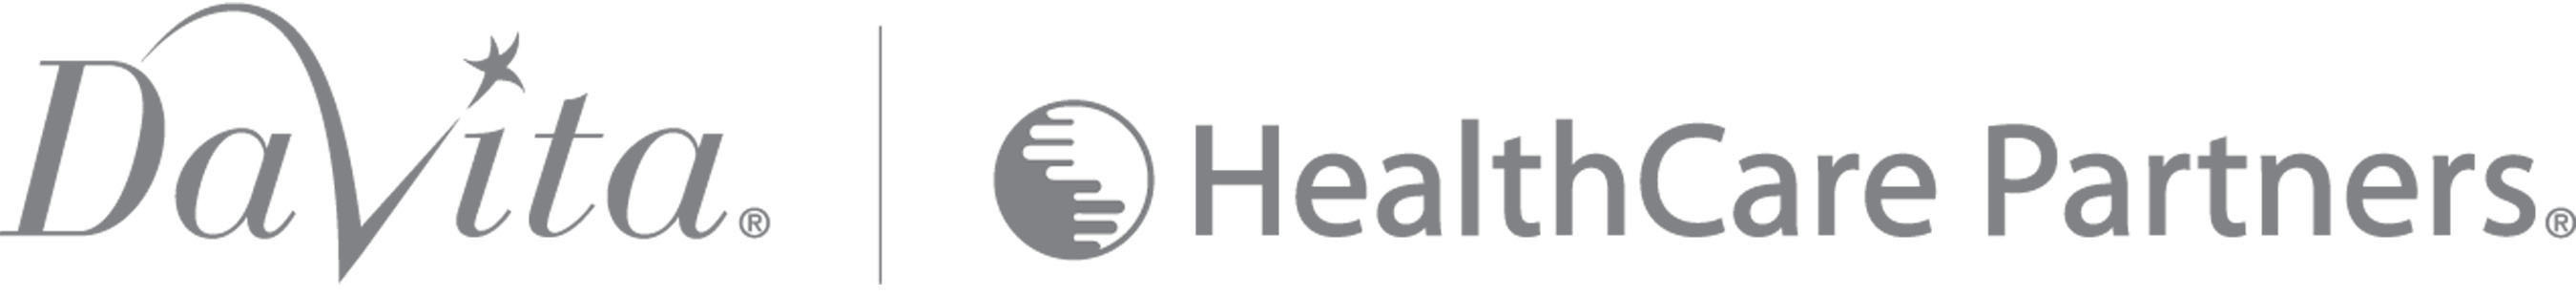 www.davitahealthcarepartners.com . (PRNewsFoto/DaVita HealthCare Partners Inc.)